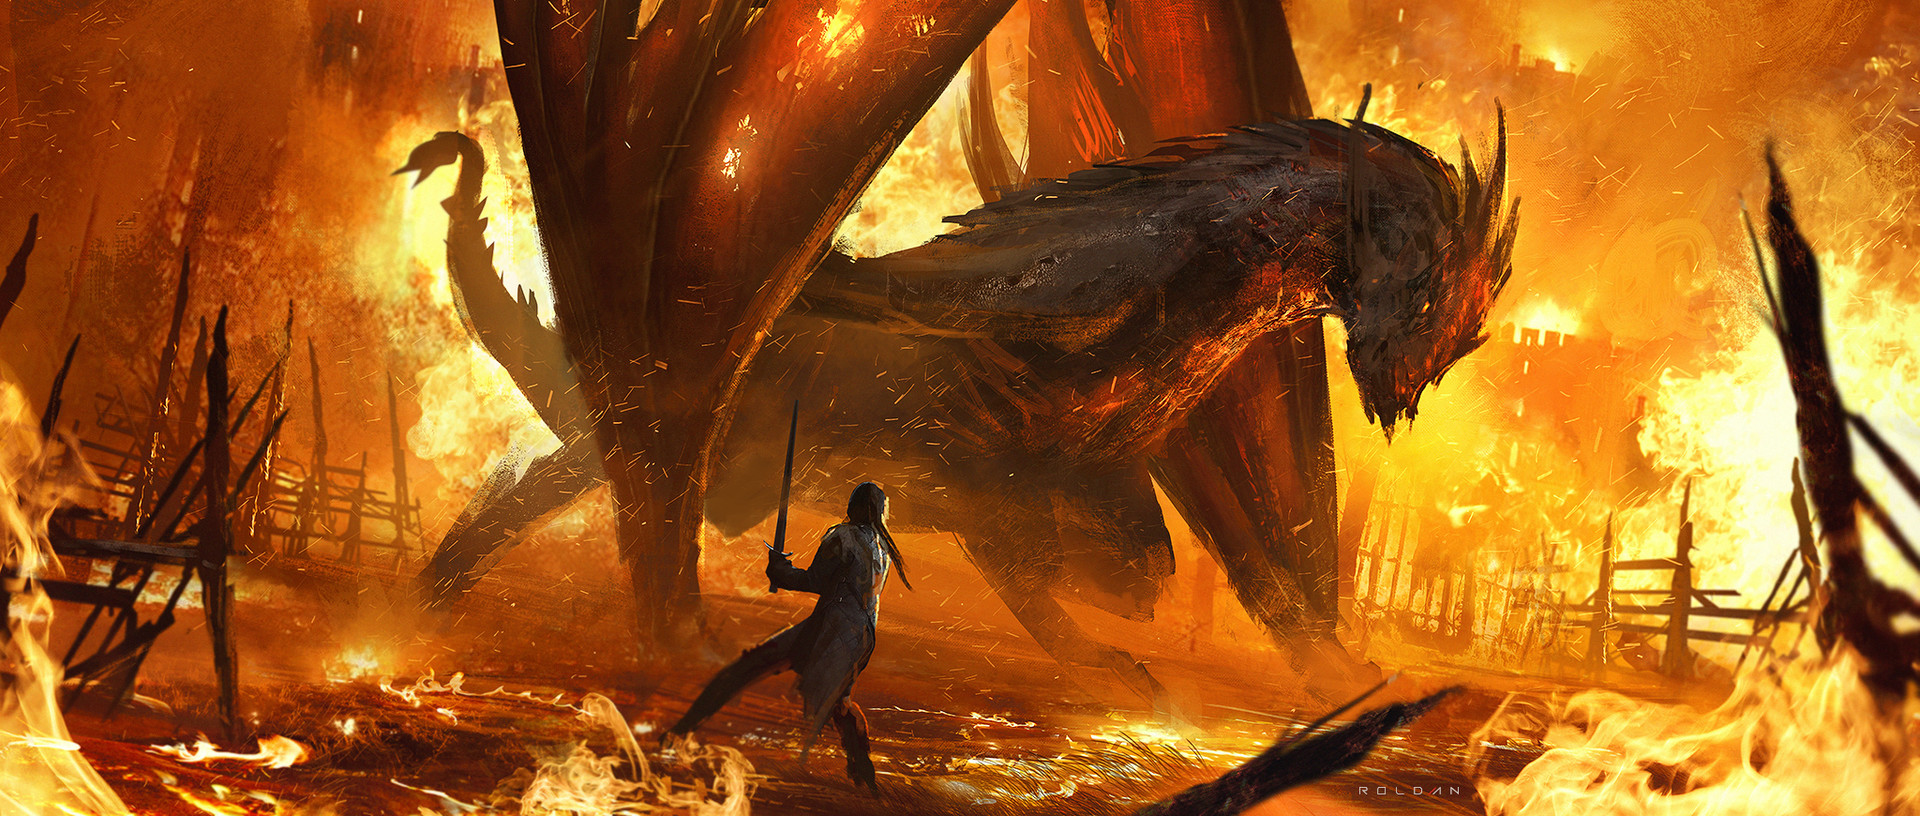 Juan pablo roldan kf0 dragon 9a